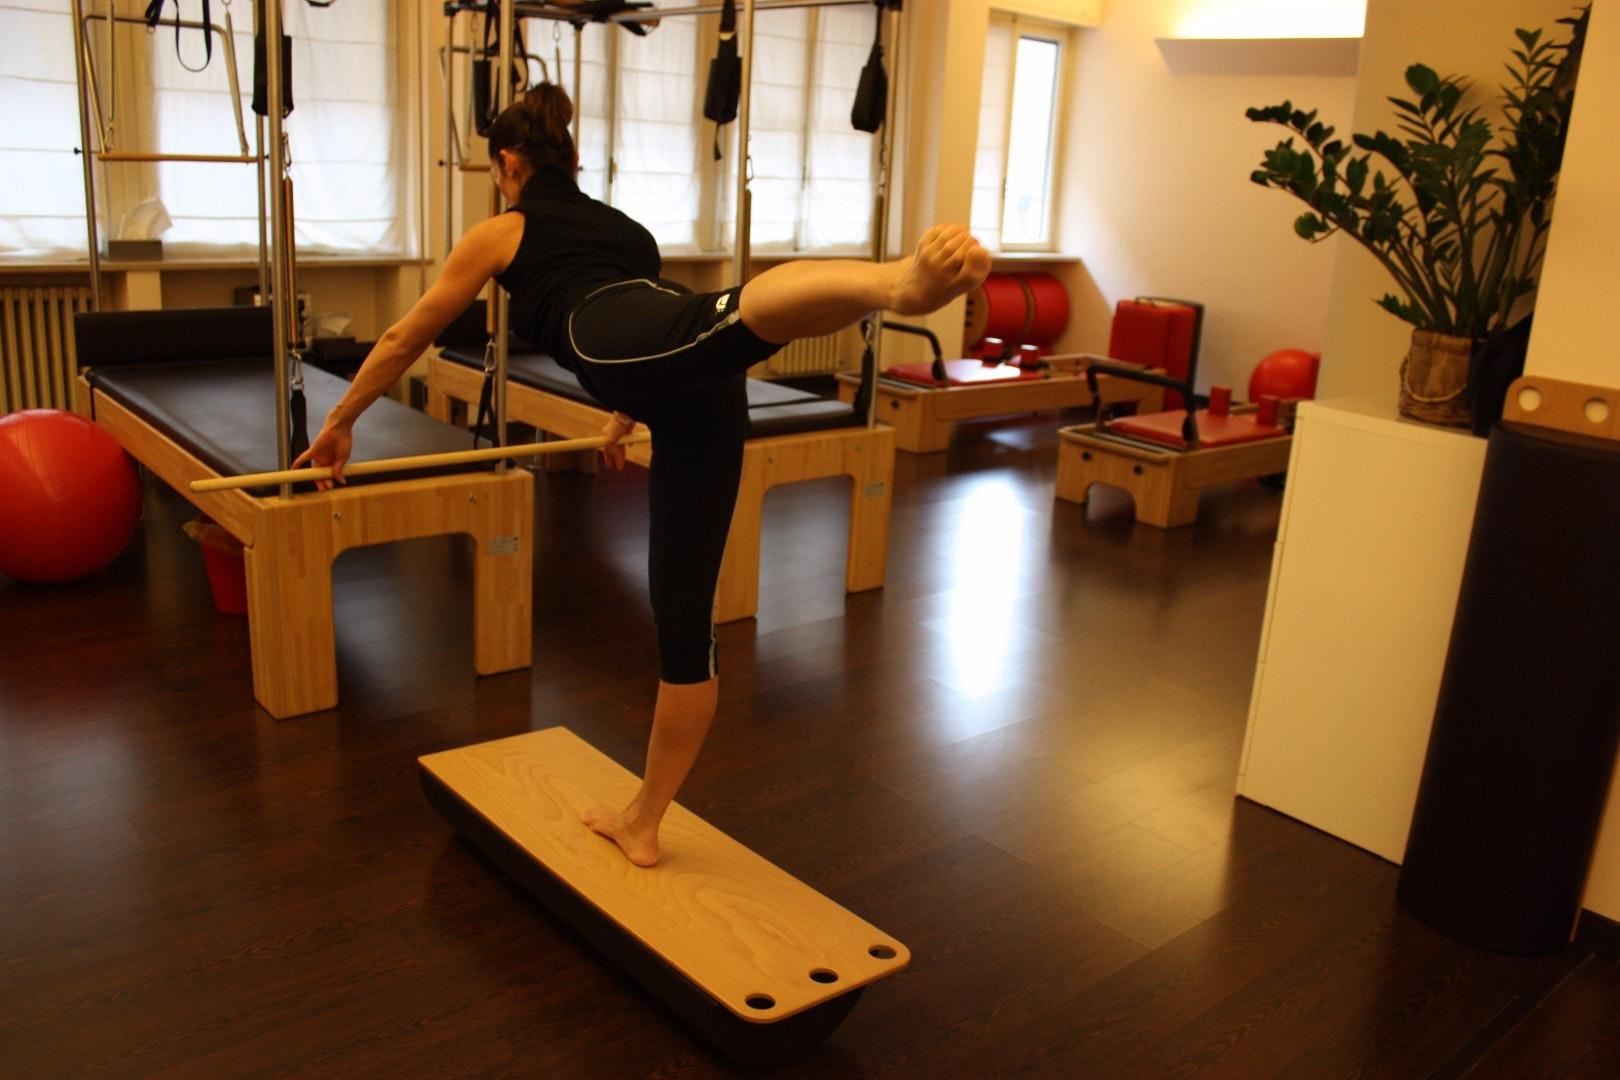 Foto 4 Offerta Body Balance Center Sas Di Bagnato Paola Maria Milano {2}